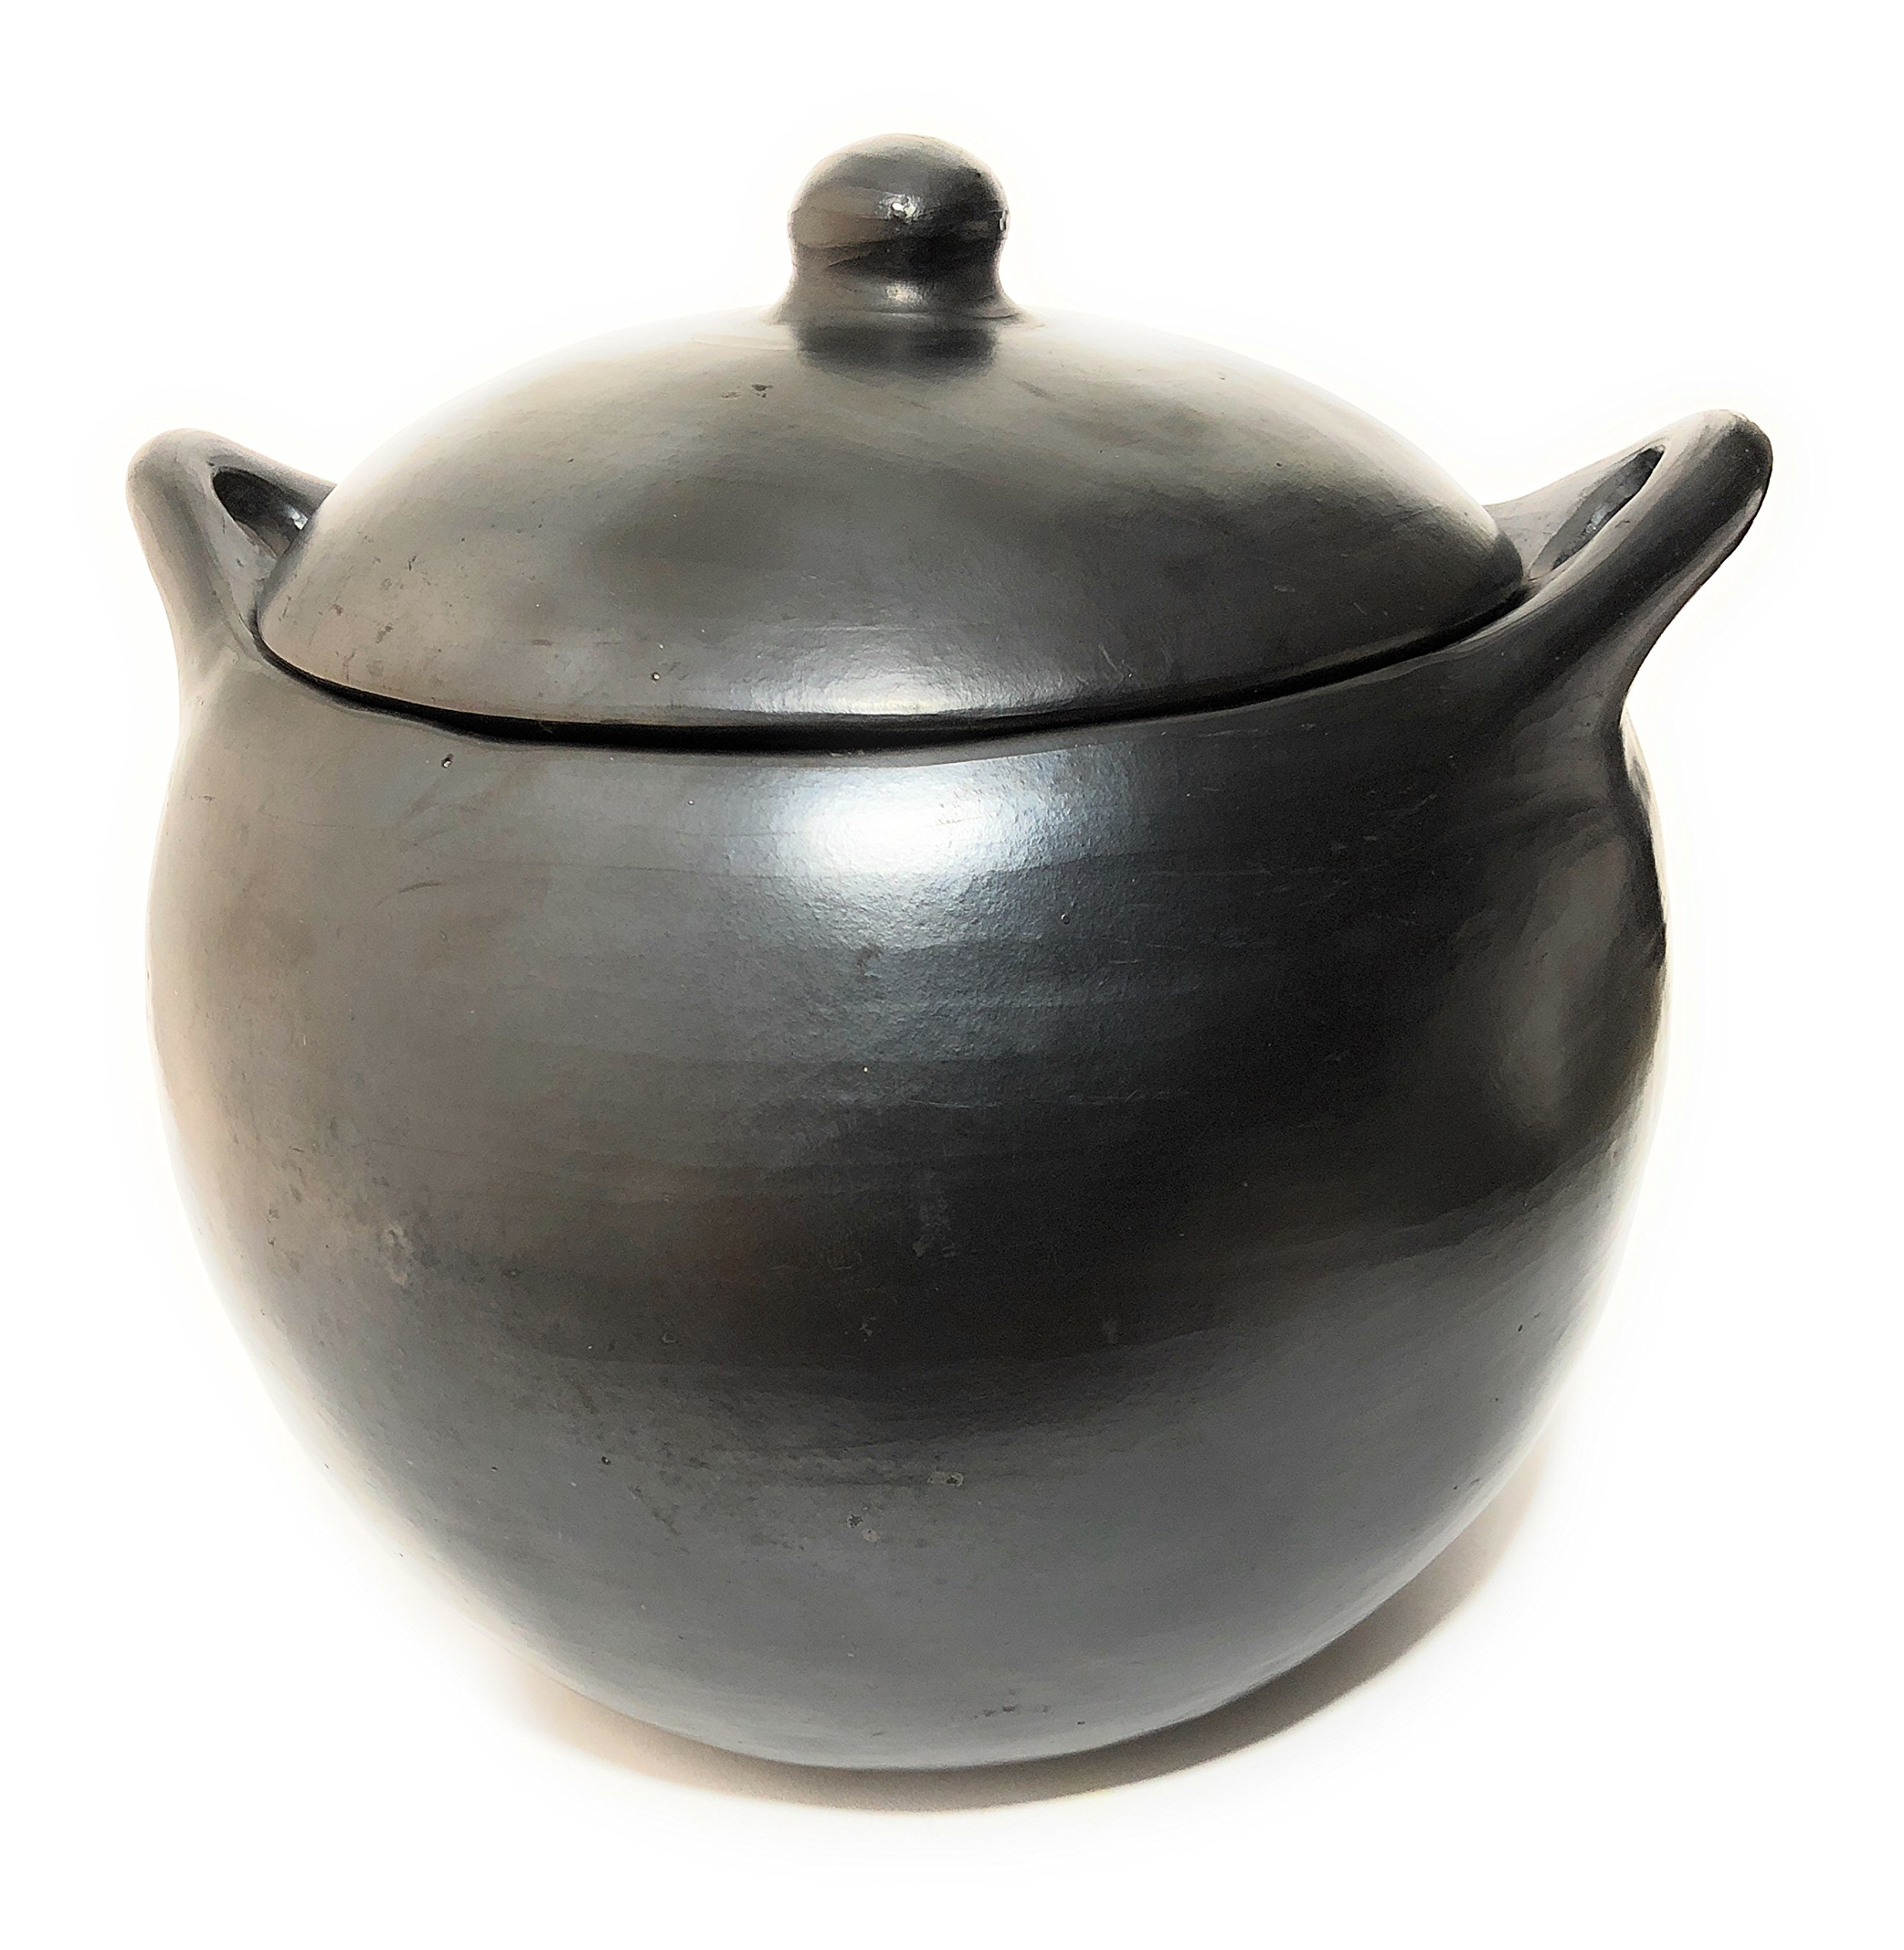 La Chamba Black Clay Soup Pot - 5 flat base